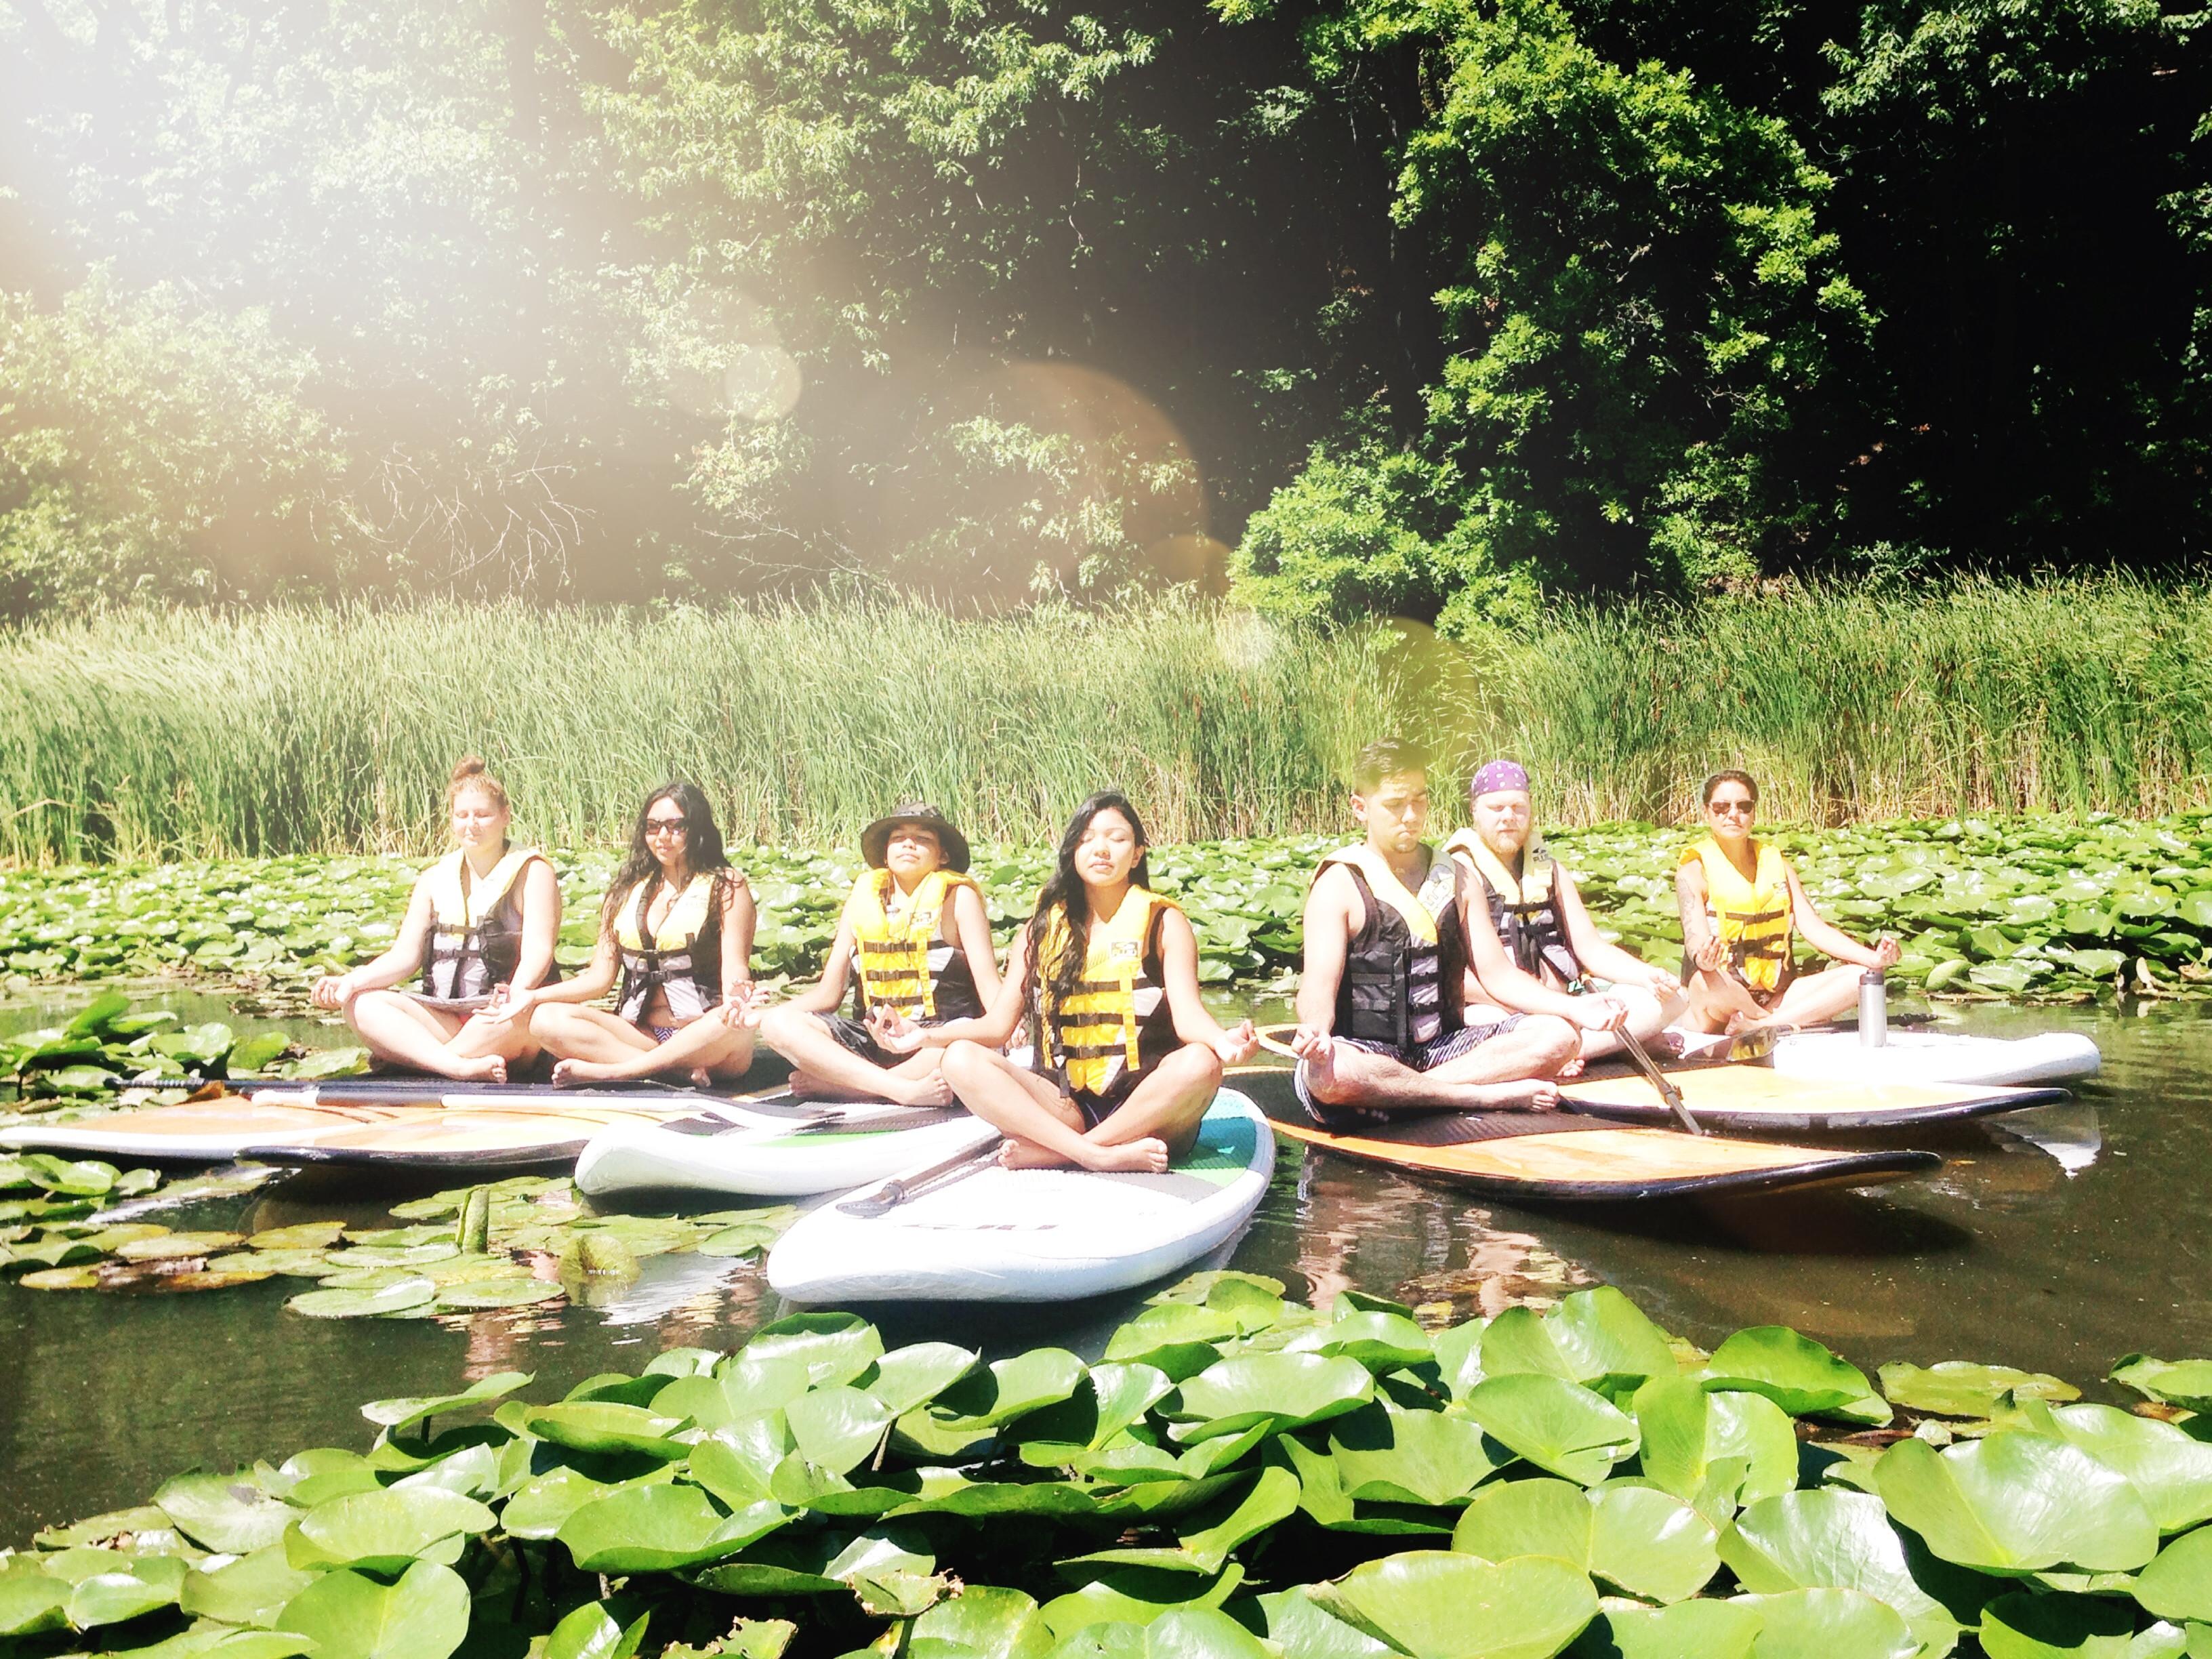 Humber River Paddle Tour